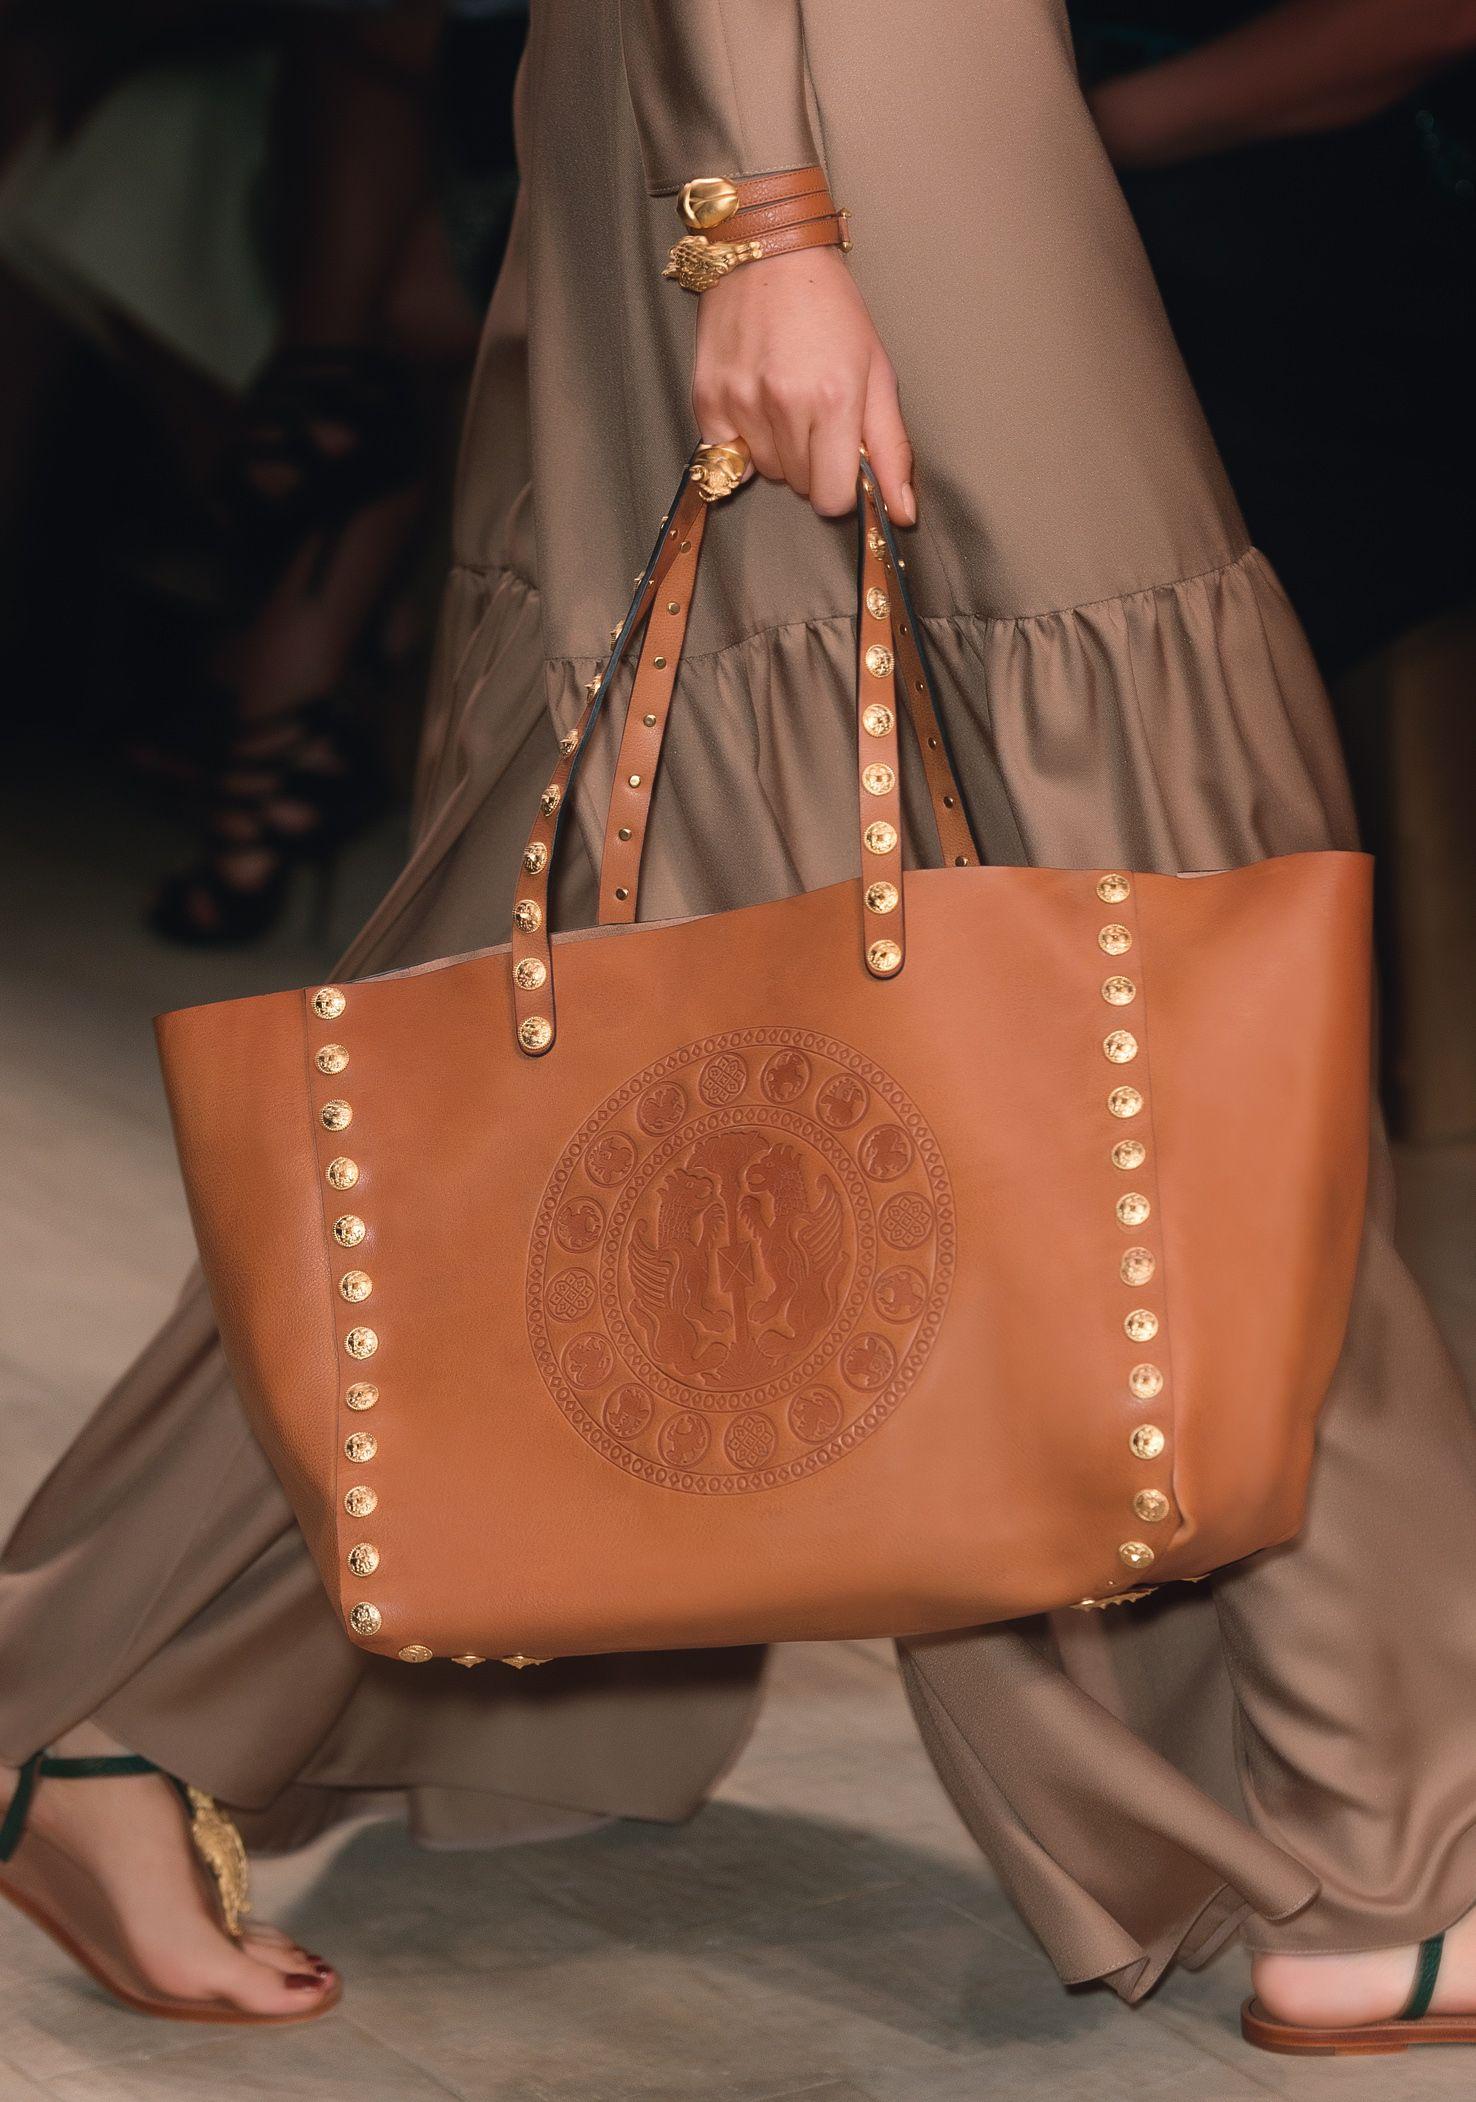 Valentino Shoes and Handbags SpringSummer 2014 advise